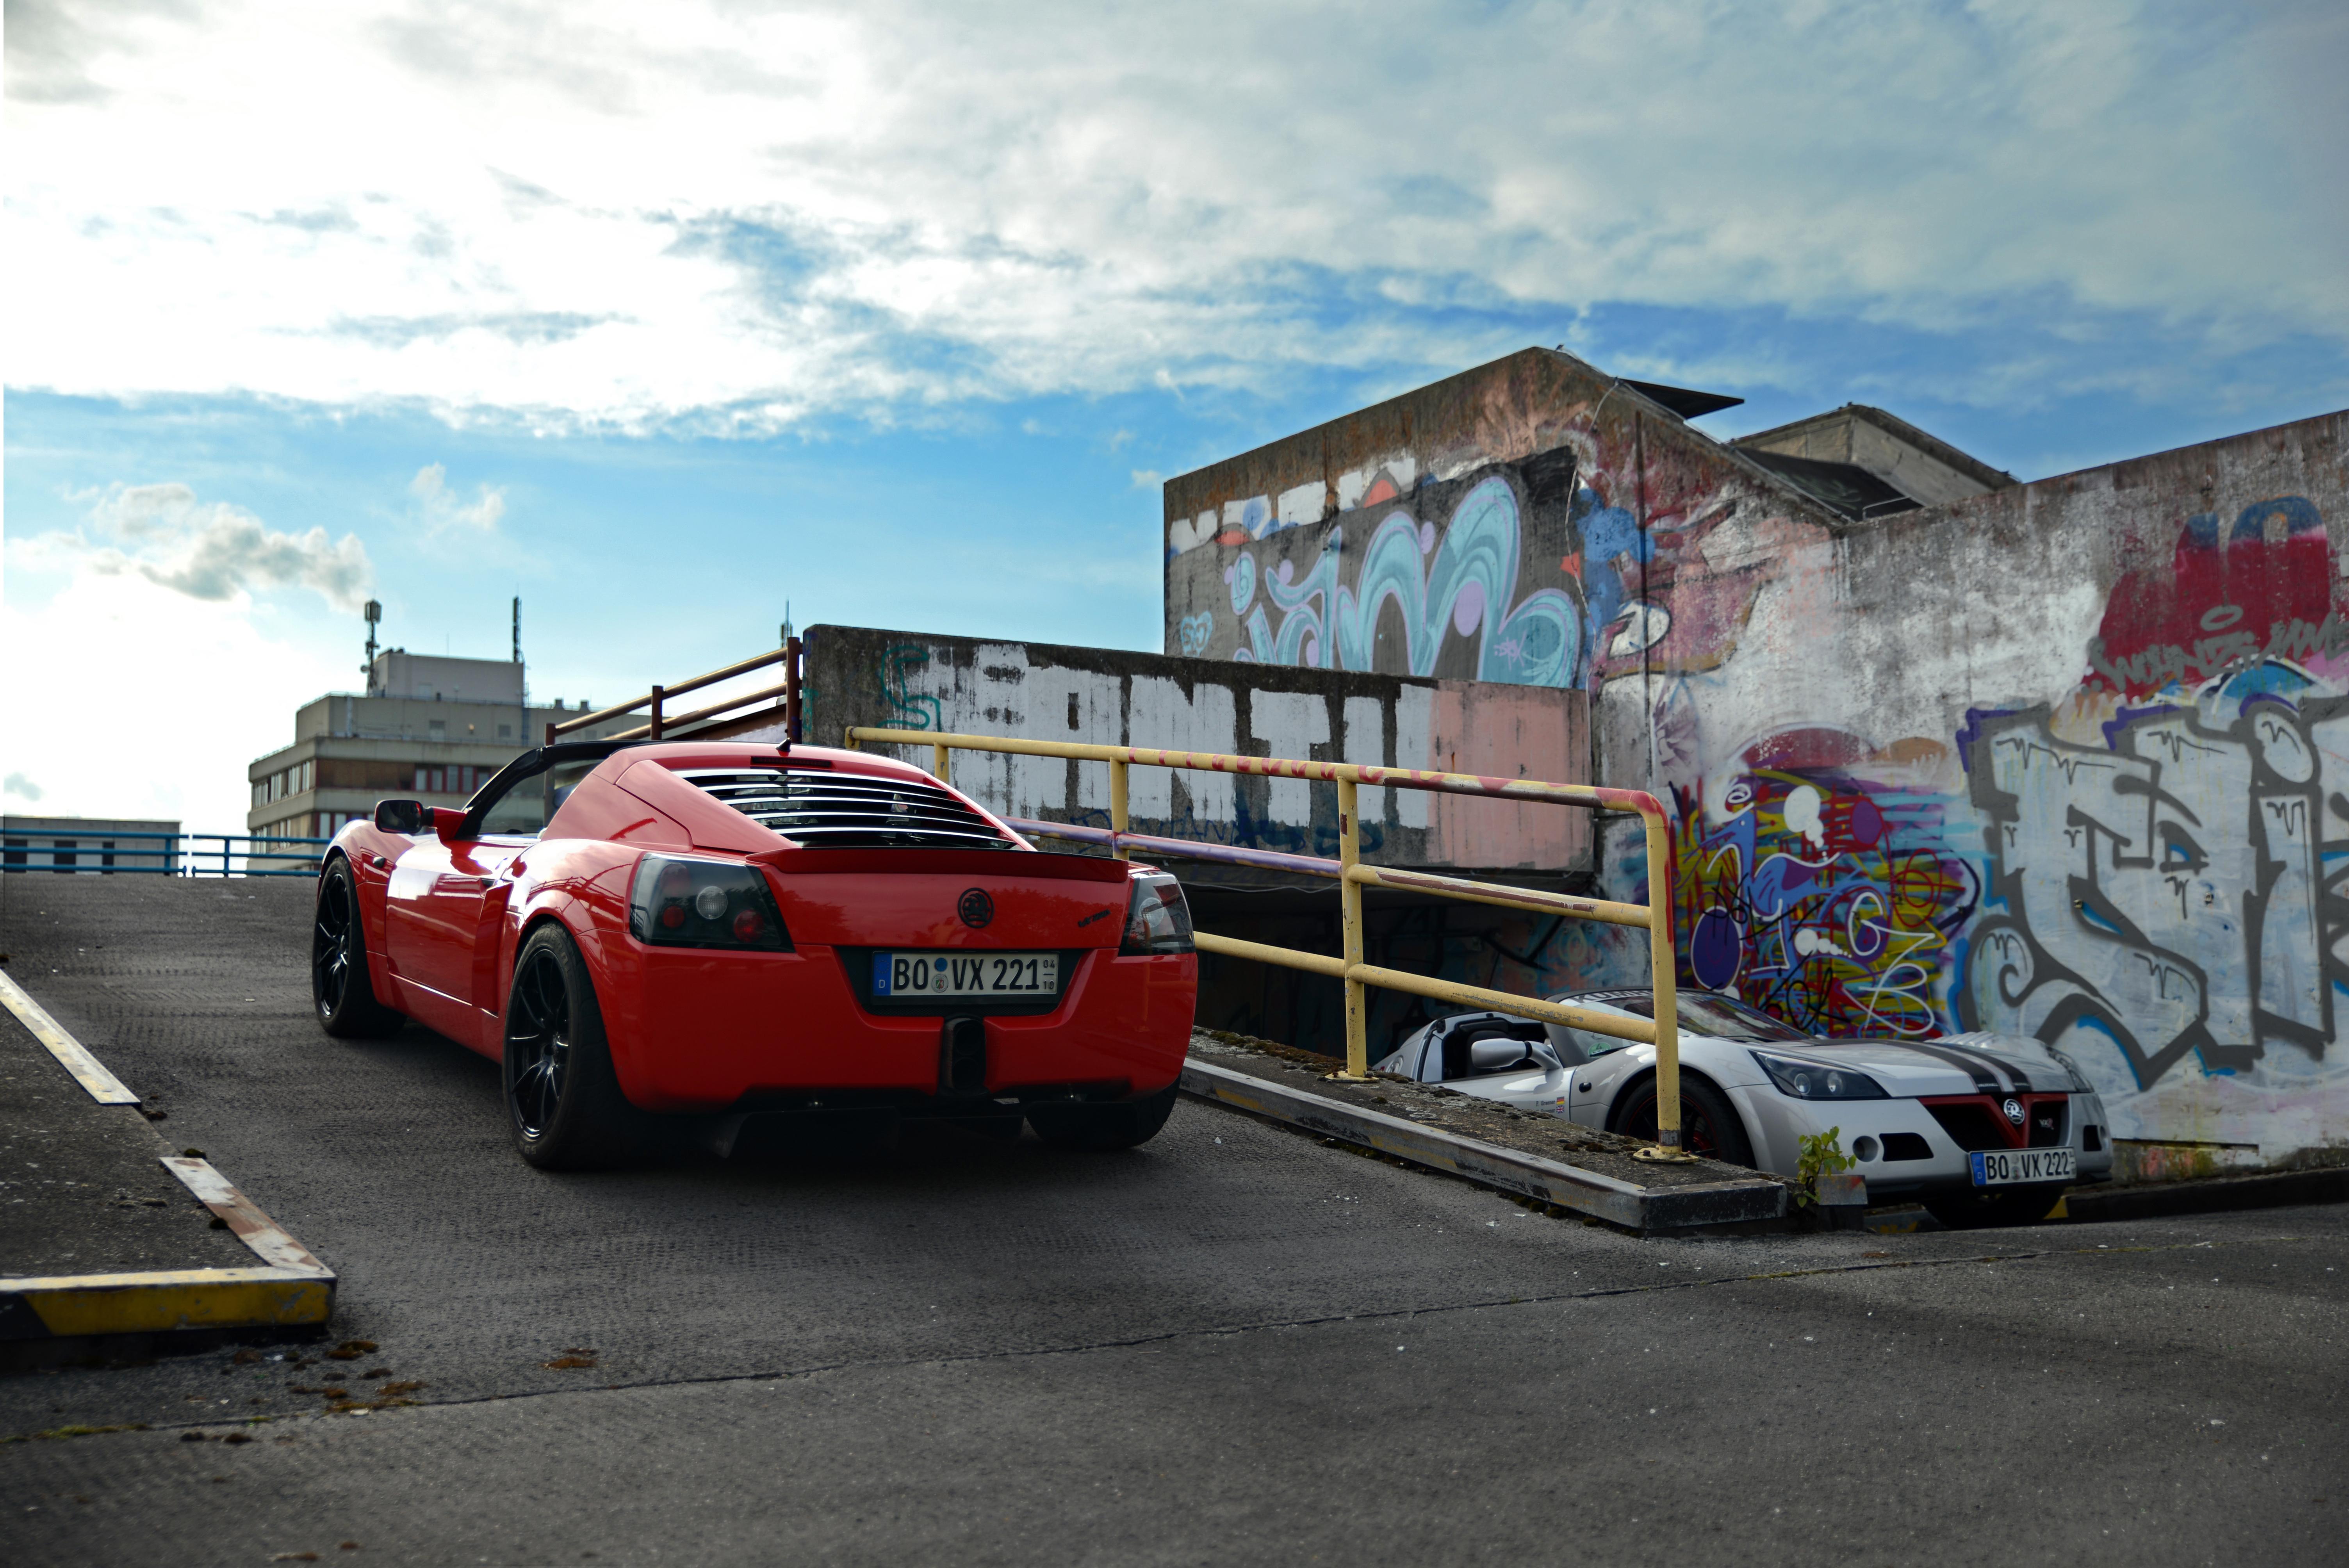 parkhaus_06g2jnp.jpg